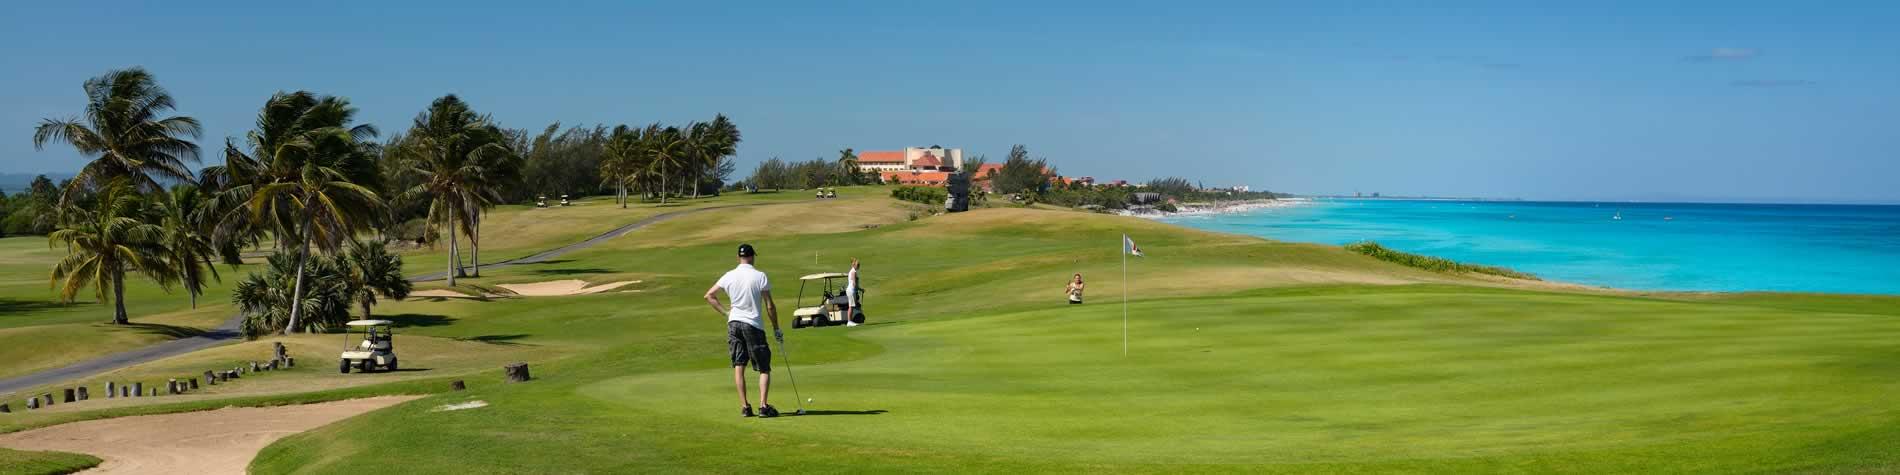 Varadero Golf Club Las Americas